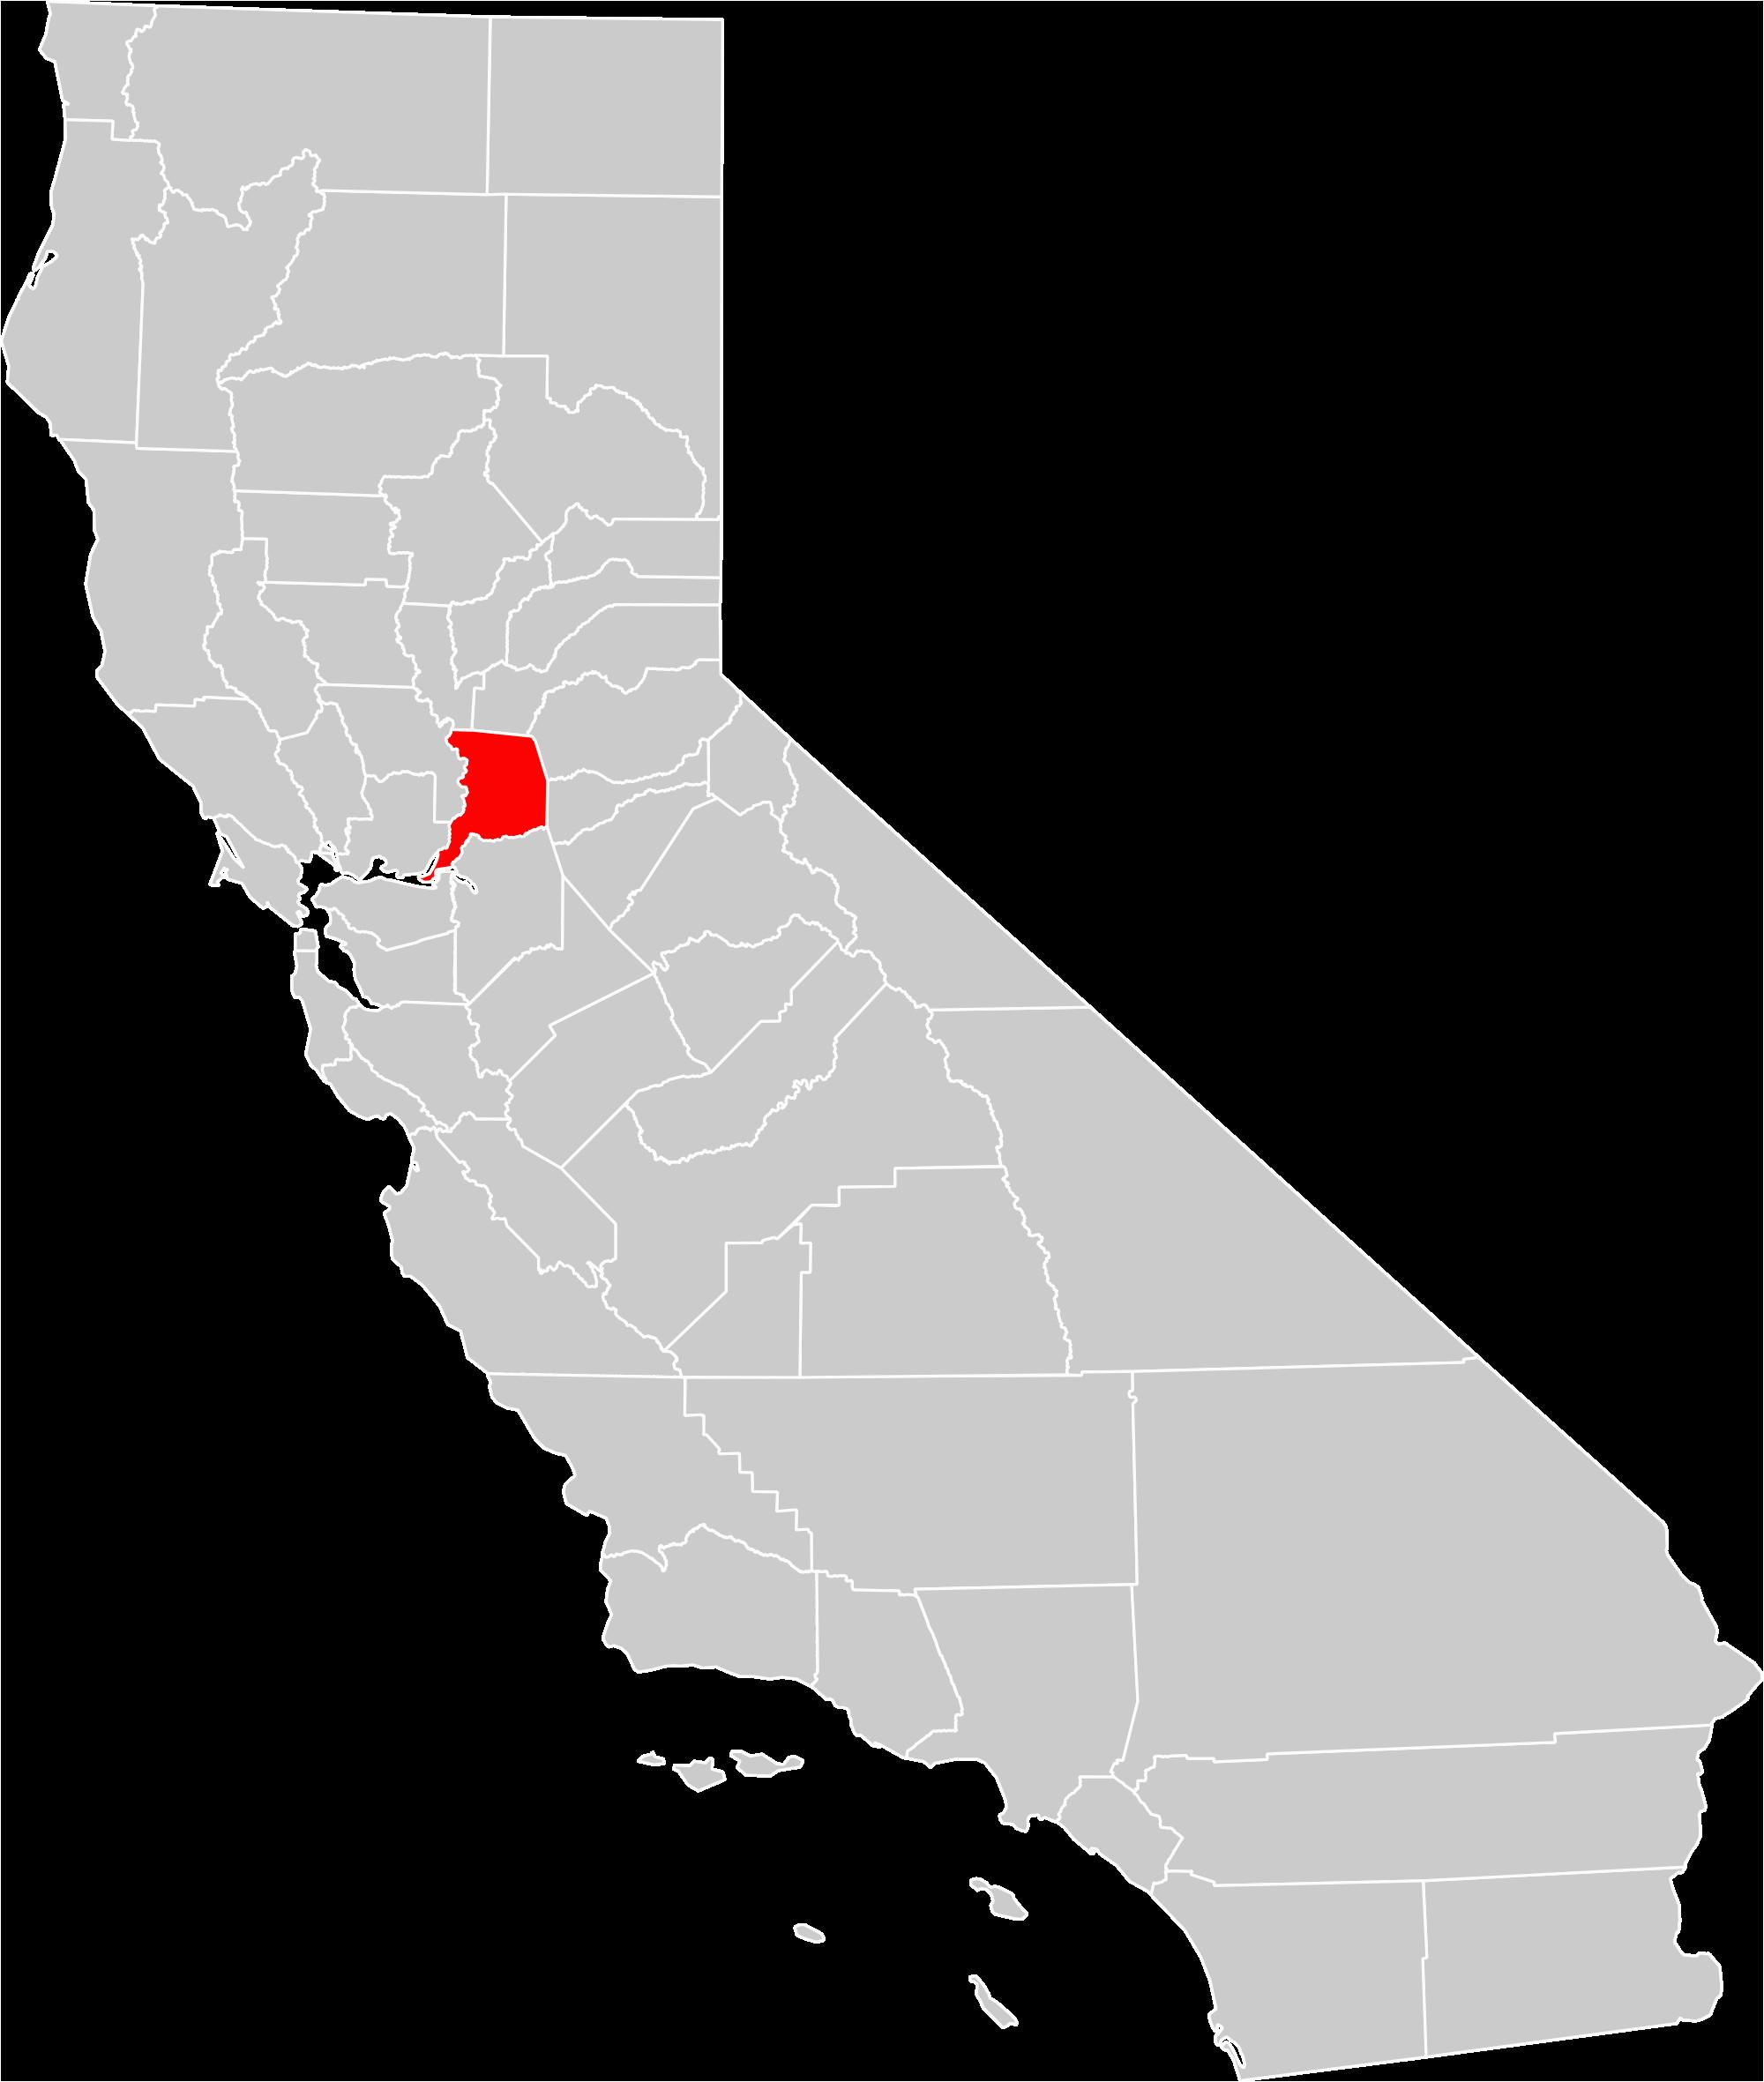 file california county map sacramento county highlighted svg